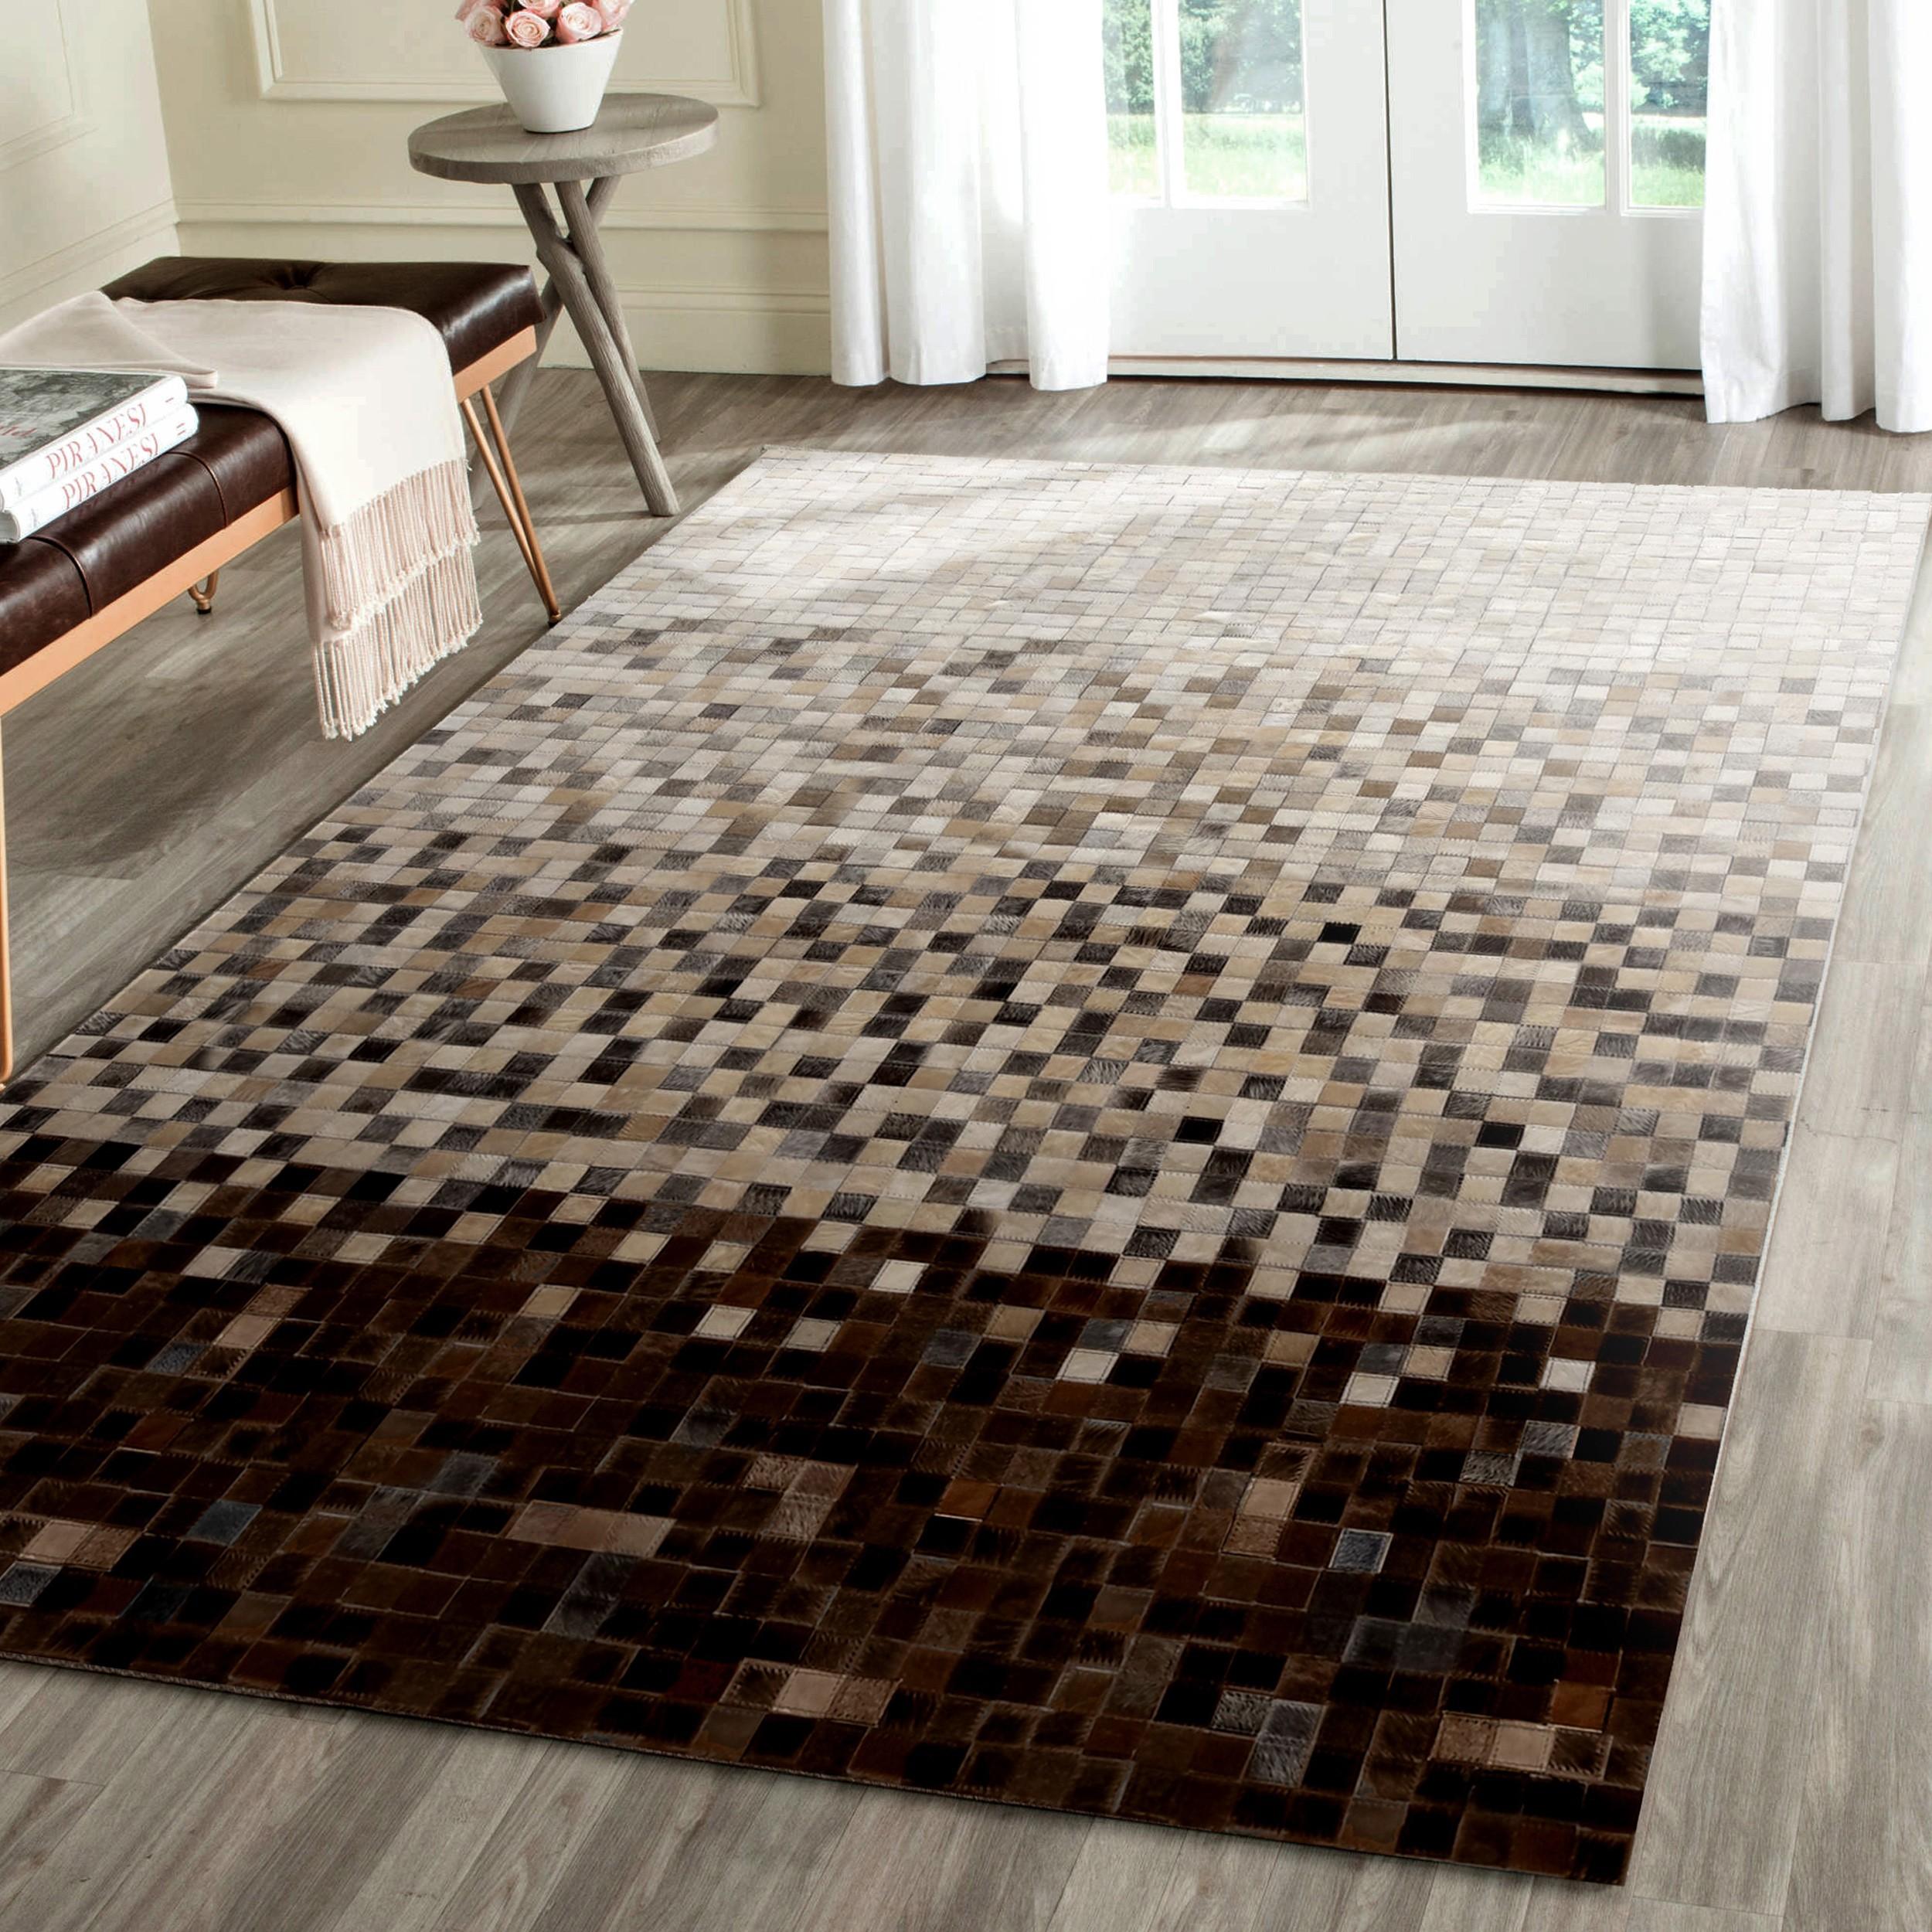 Tapis cuir Sanjay 200x300 cm : commandez les tapis cuir Sanjay ...